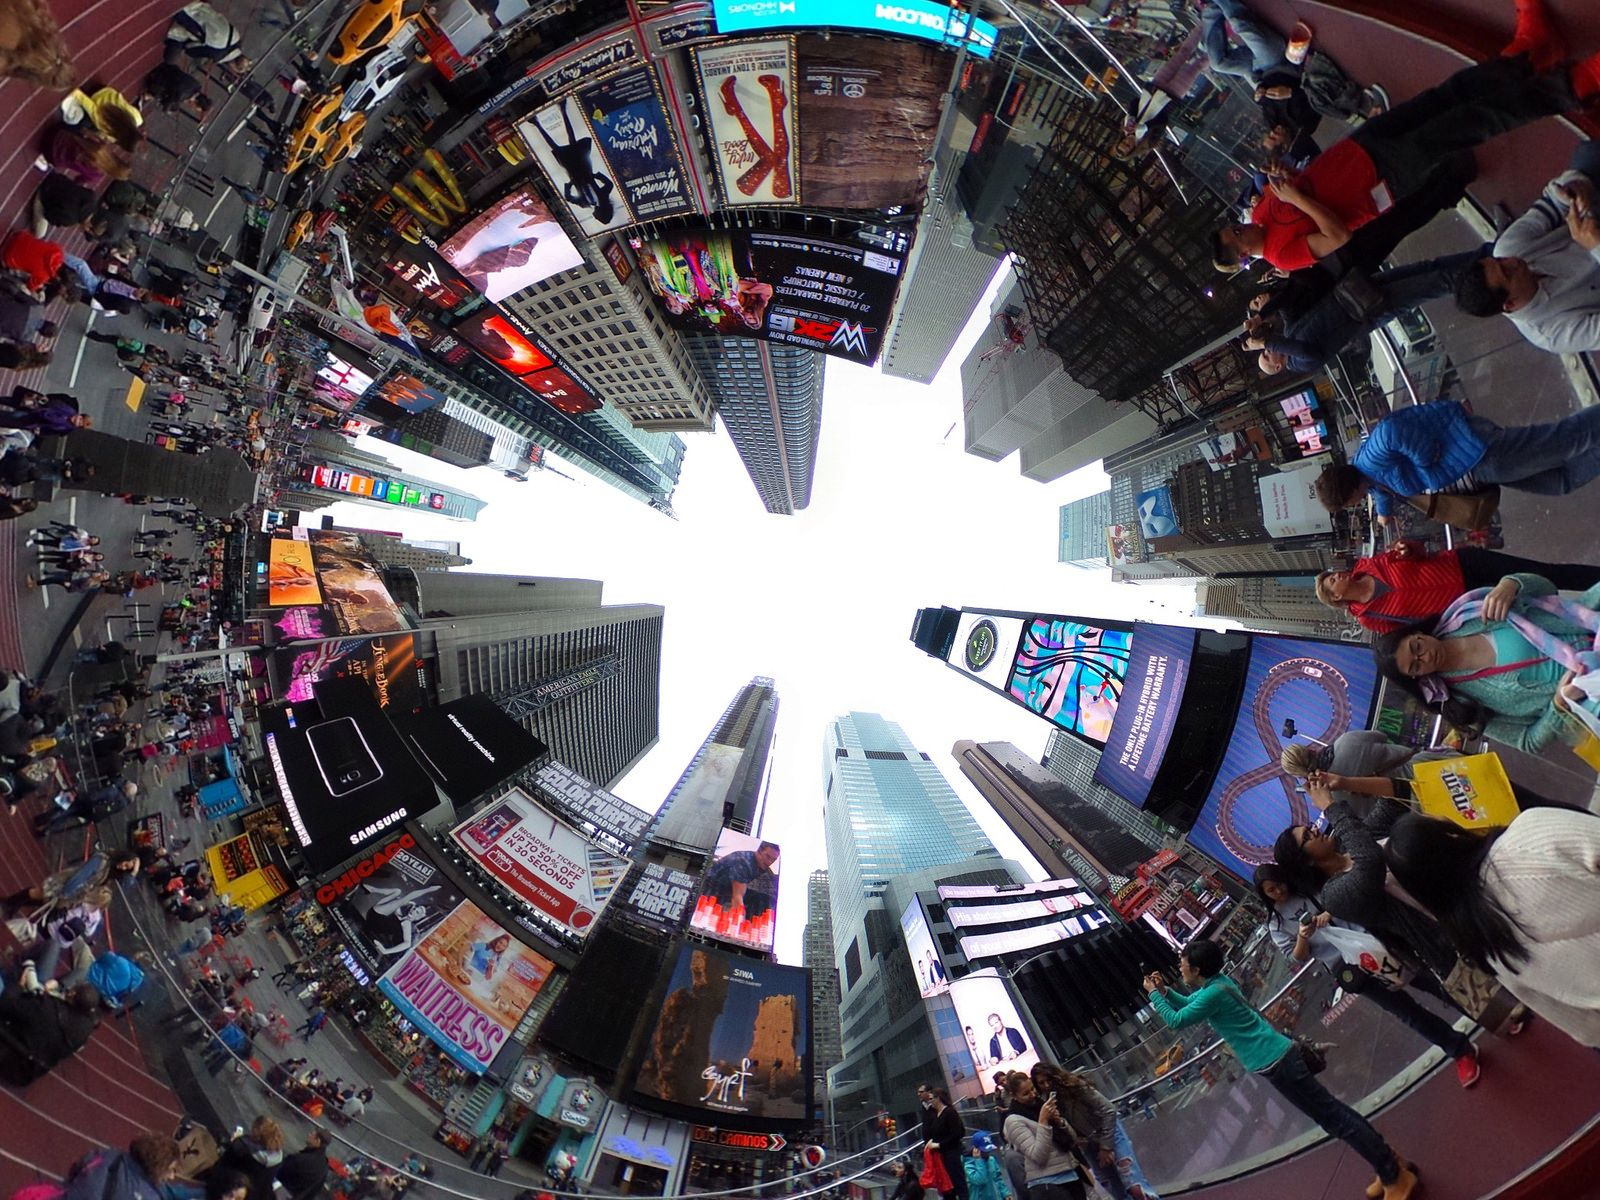 360 Degree Times Square Ny 2048 X 1536 Want An Ipad Air Air 2 Air Pro Follow Ipad Air Wallpapers To Downl Times Square Ny Ipad Air Wallpaper Times Square